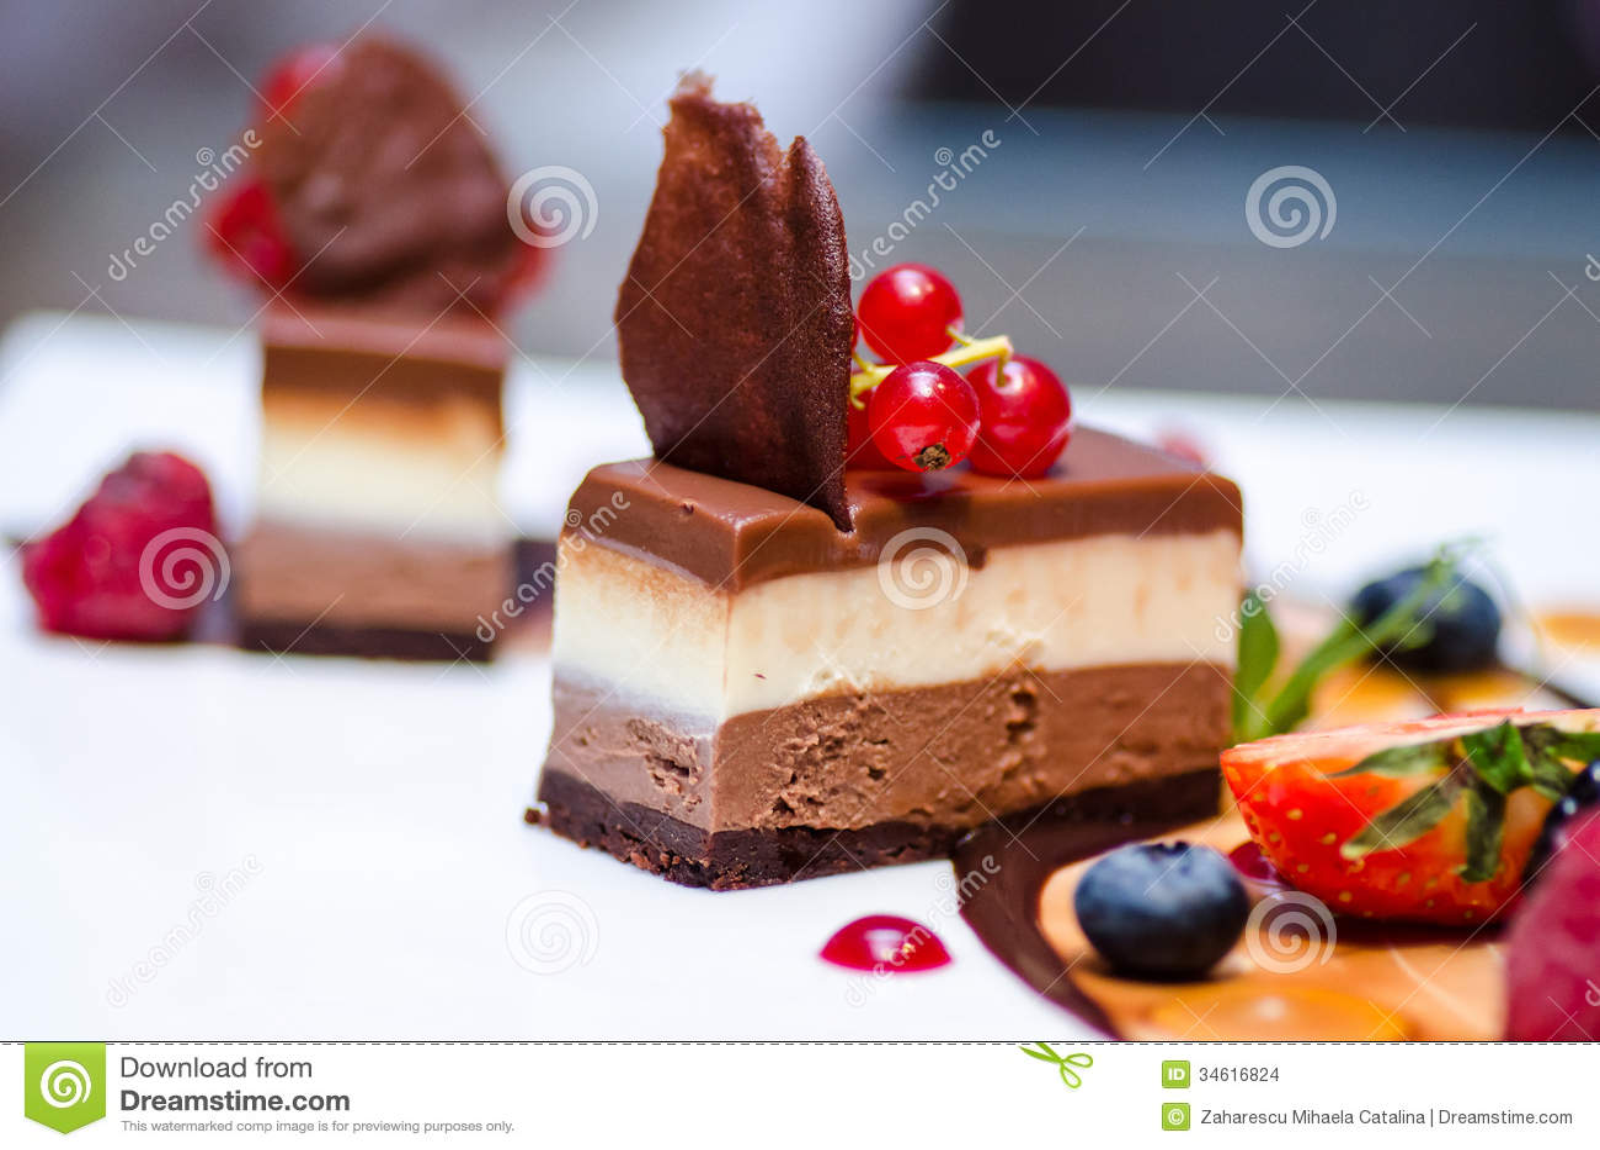 Triple Chocolate Dessert Stock Images - Image: 34616824